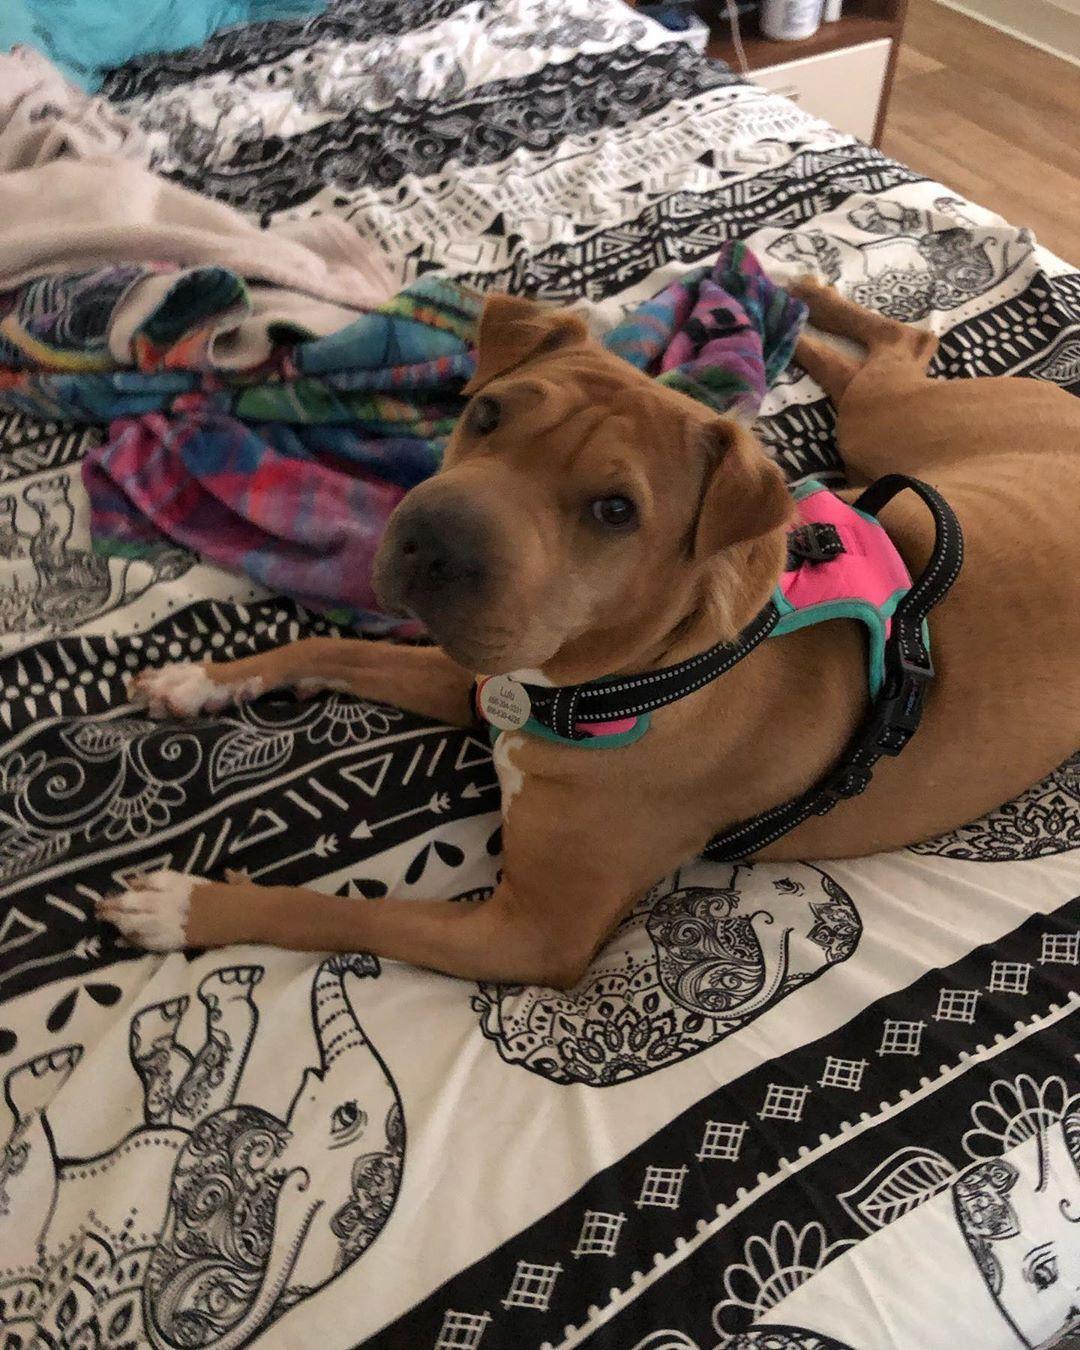 Cutie dogmom puppylove lulu mygirl queenlulu